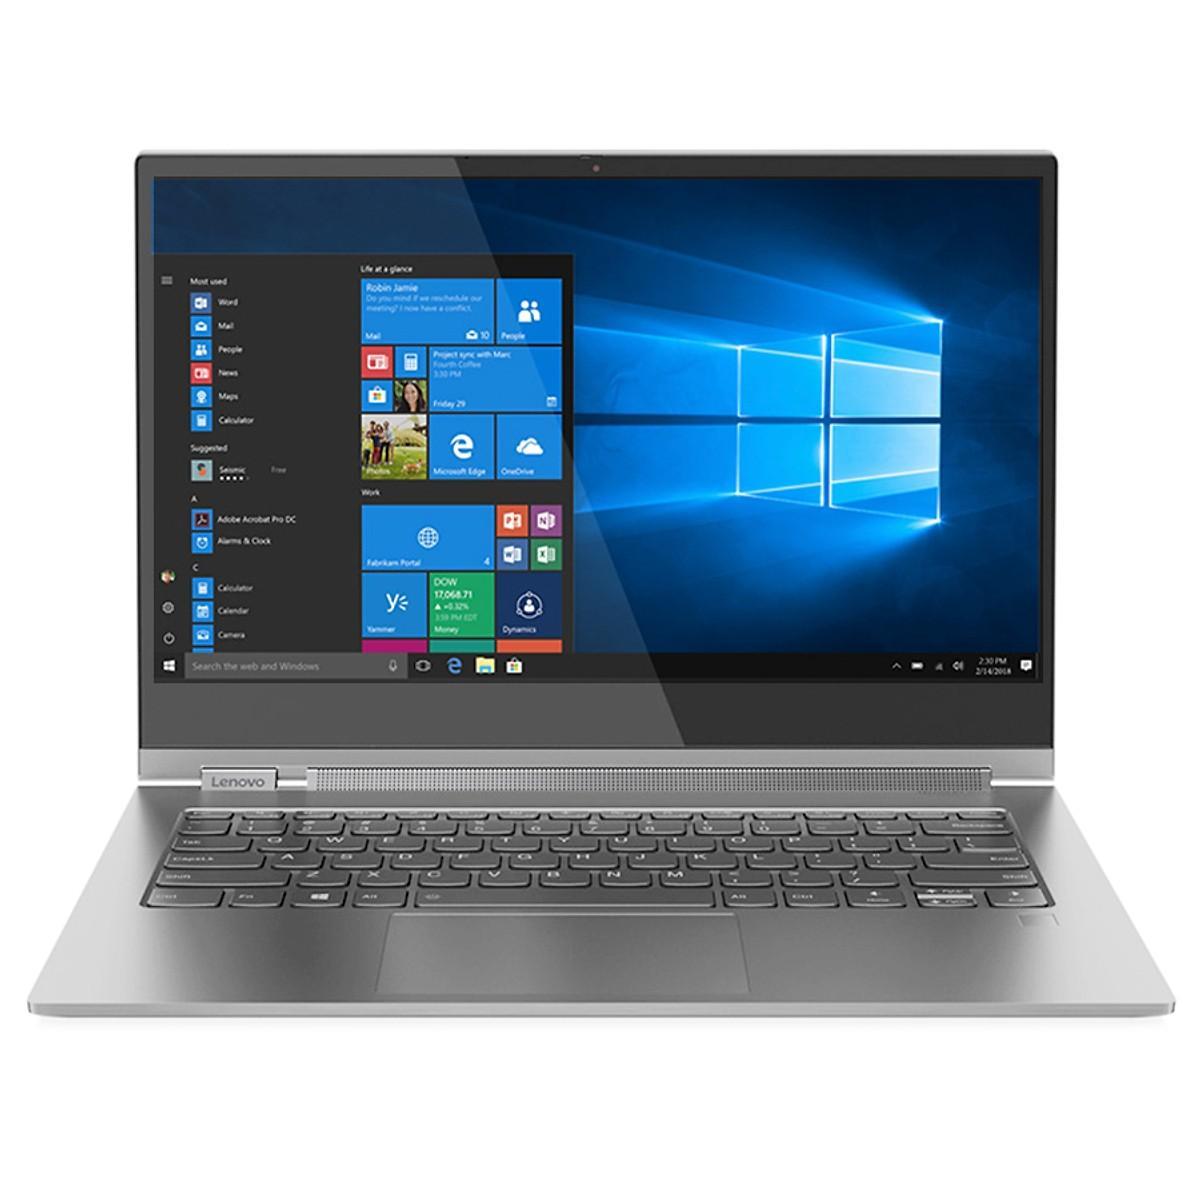 Laptop Lenovo Yoga C930-13IKB 81C4009QVN Core i7-8550U/ Win10 + Office 365 (13.9 UHD IPS Touch)